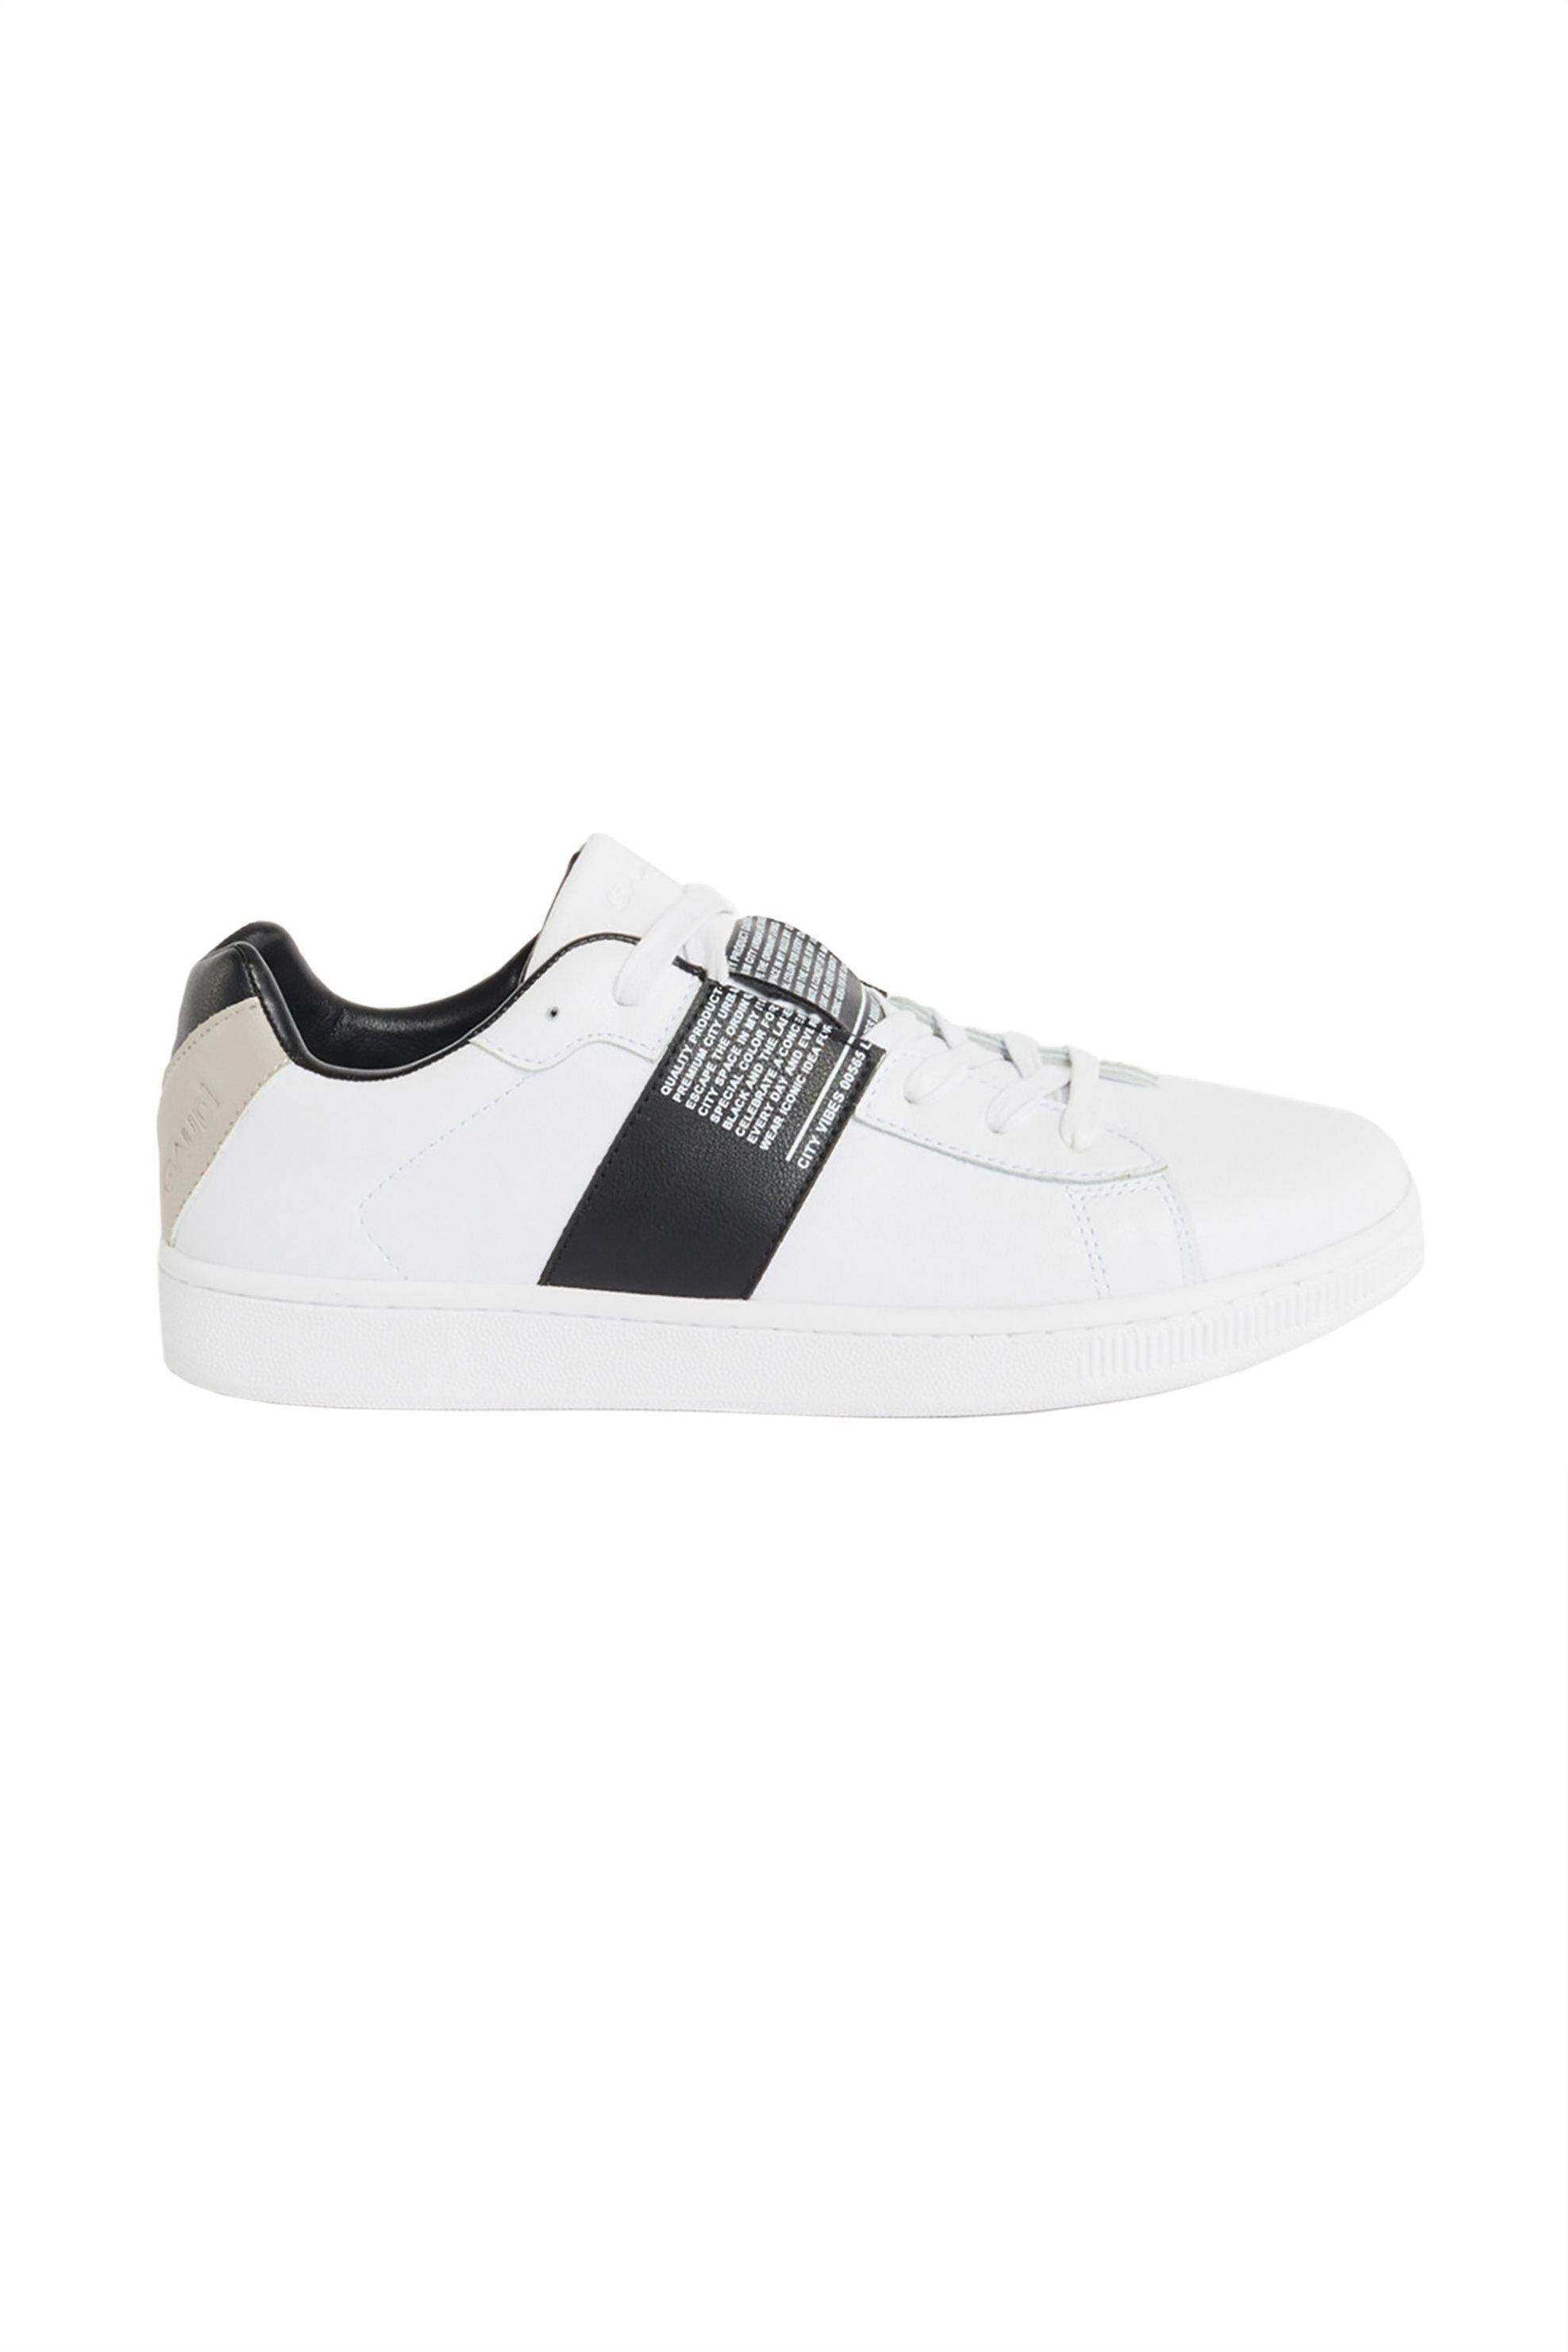 Gaudi ανδρικά sneakers με letter print – V11-61540 – Λευκό